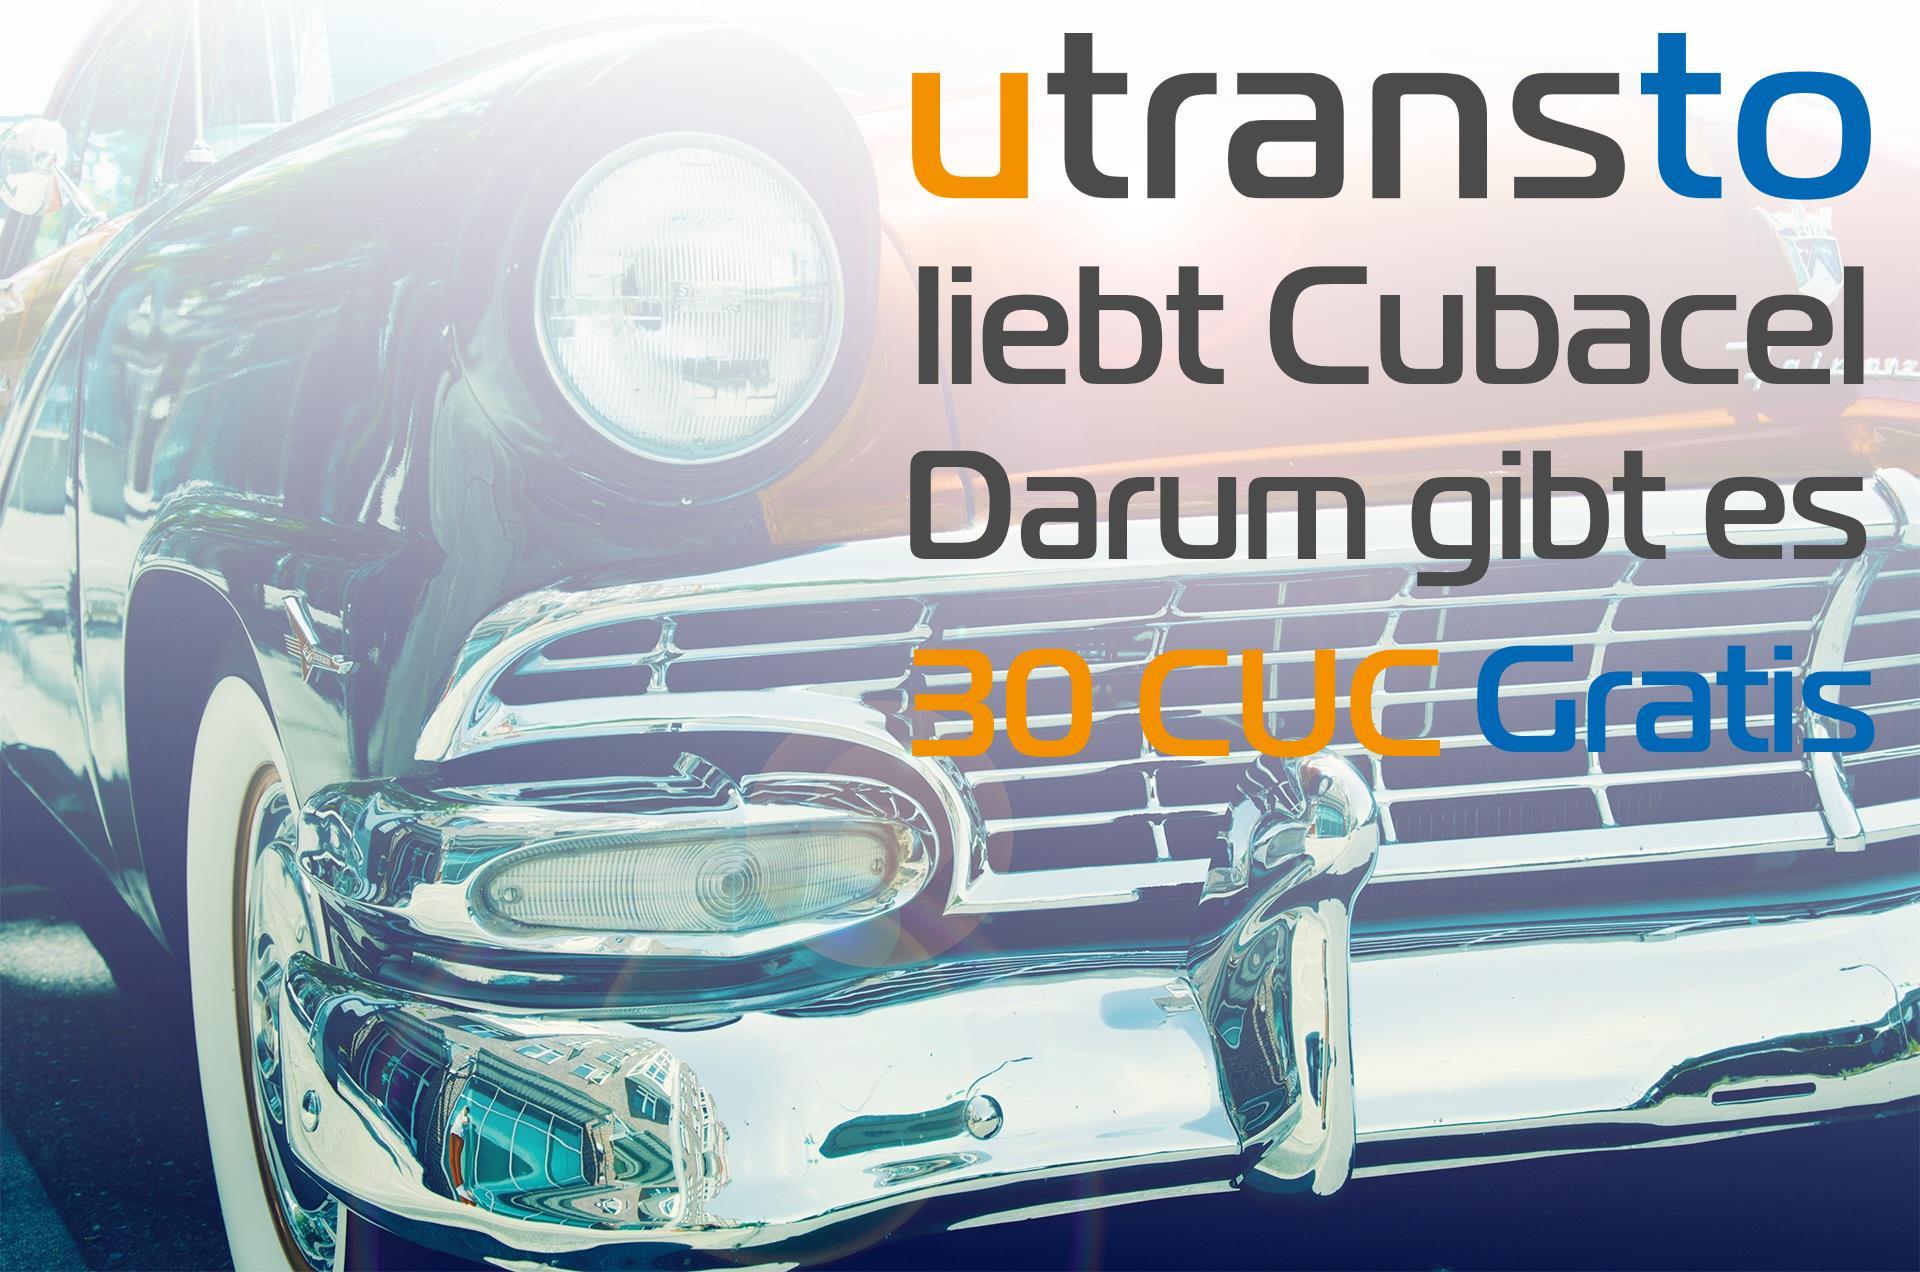 Cubacel Herbst Promo Aktion   30,- CUC Bonus!